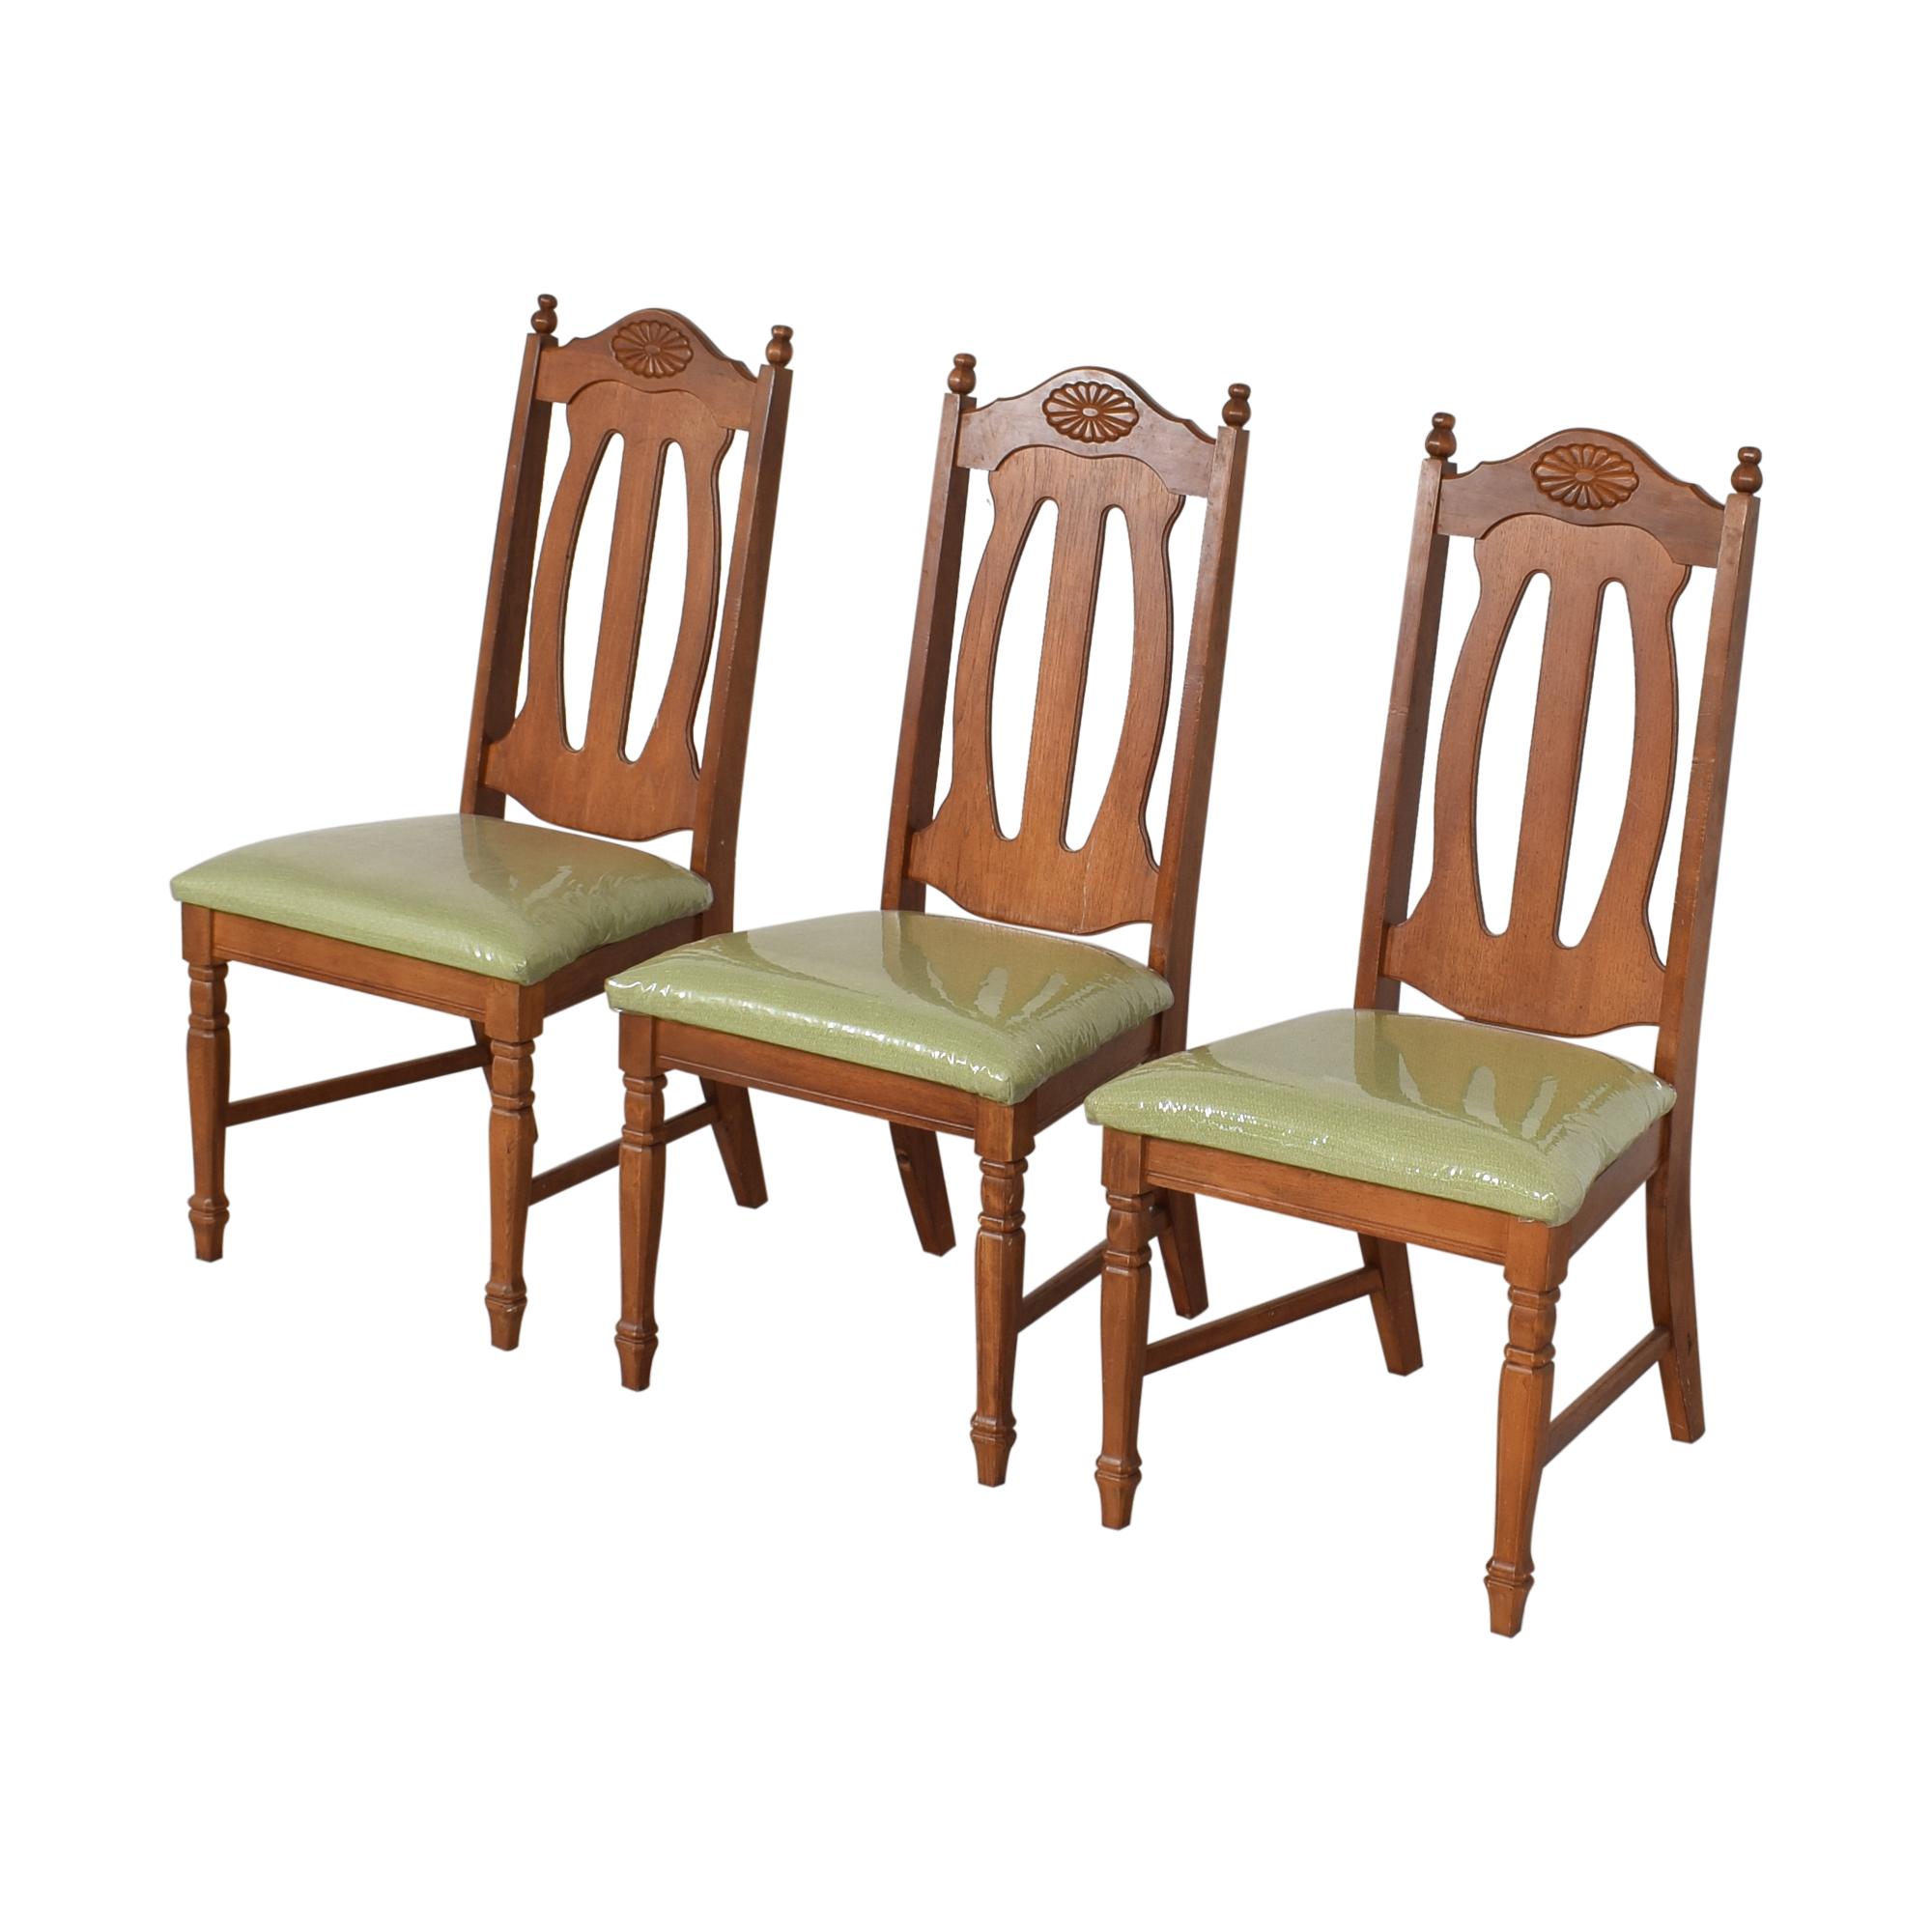 Bassett Furniture Bassett Furniture Vintage Dining Chairs on sale